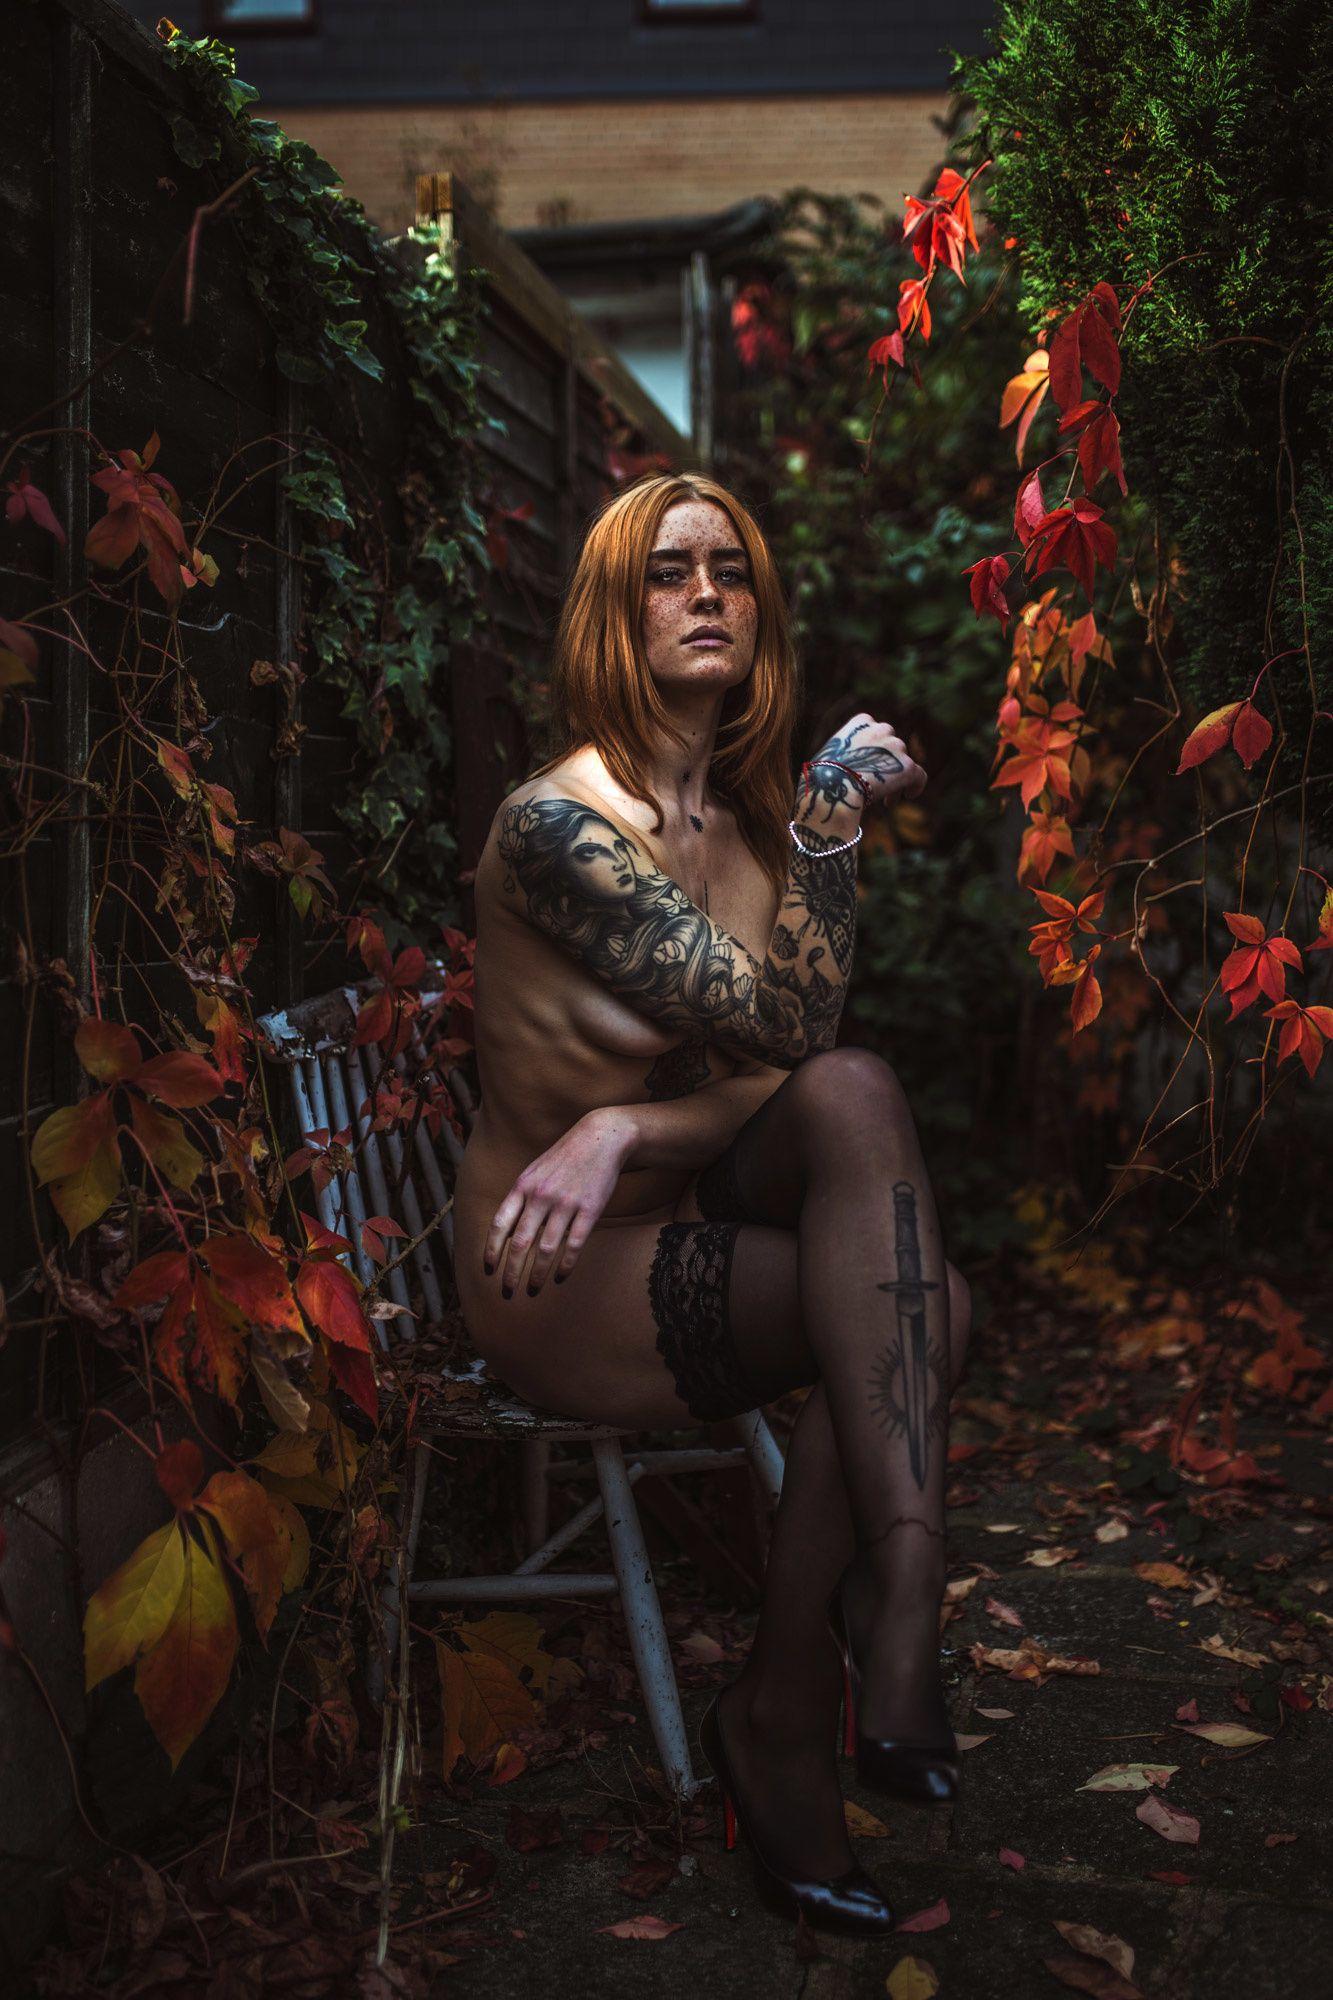 Annette Roque Lauer nudes (55 pictures), images Bikini, Instagram, bra 2015